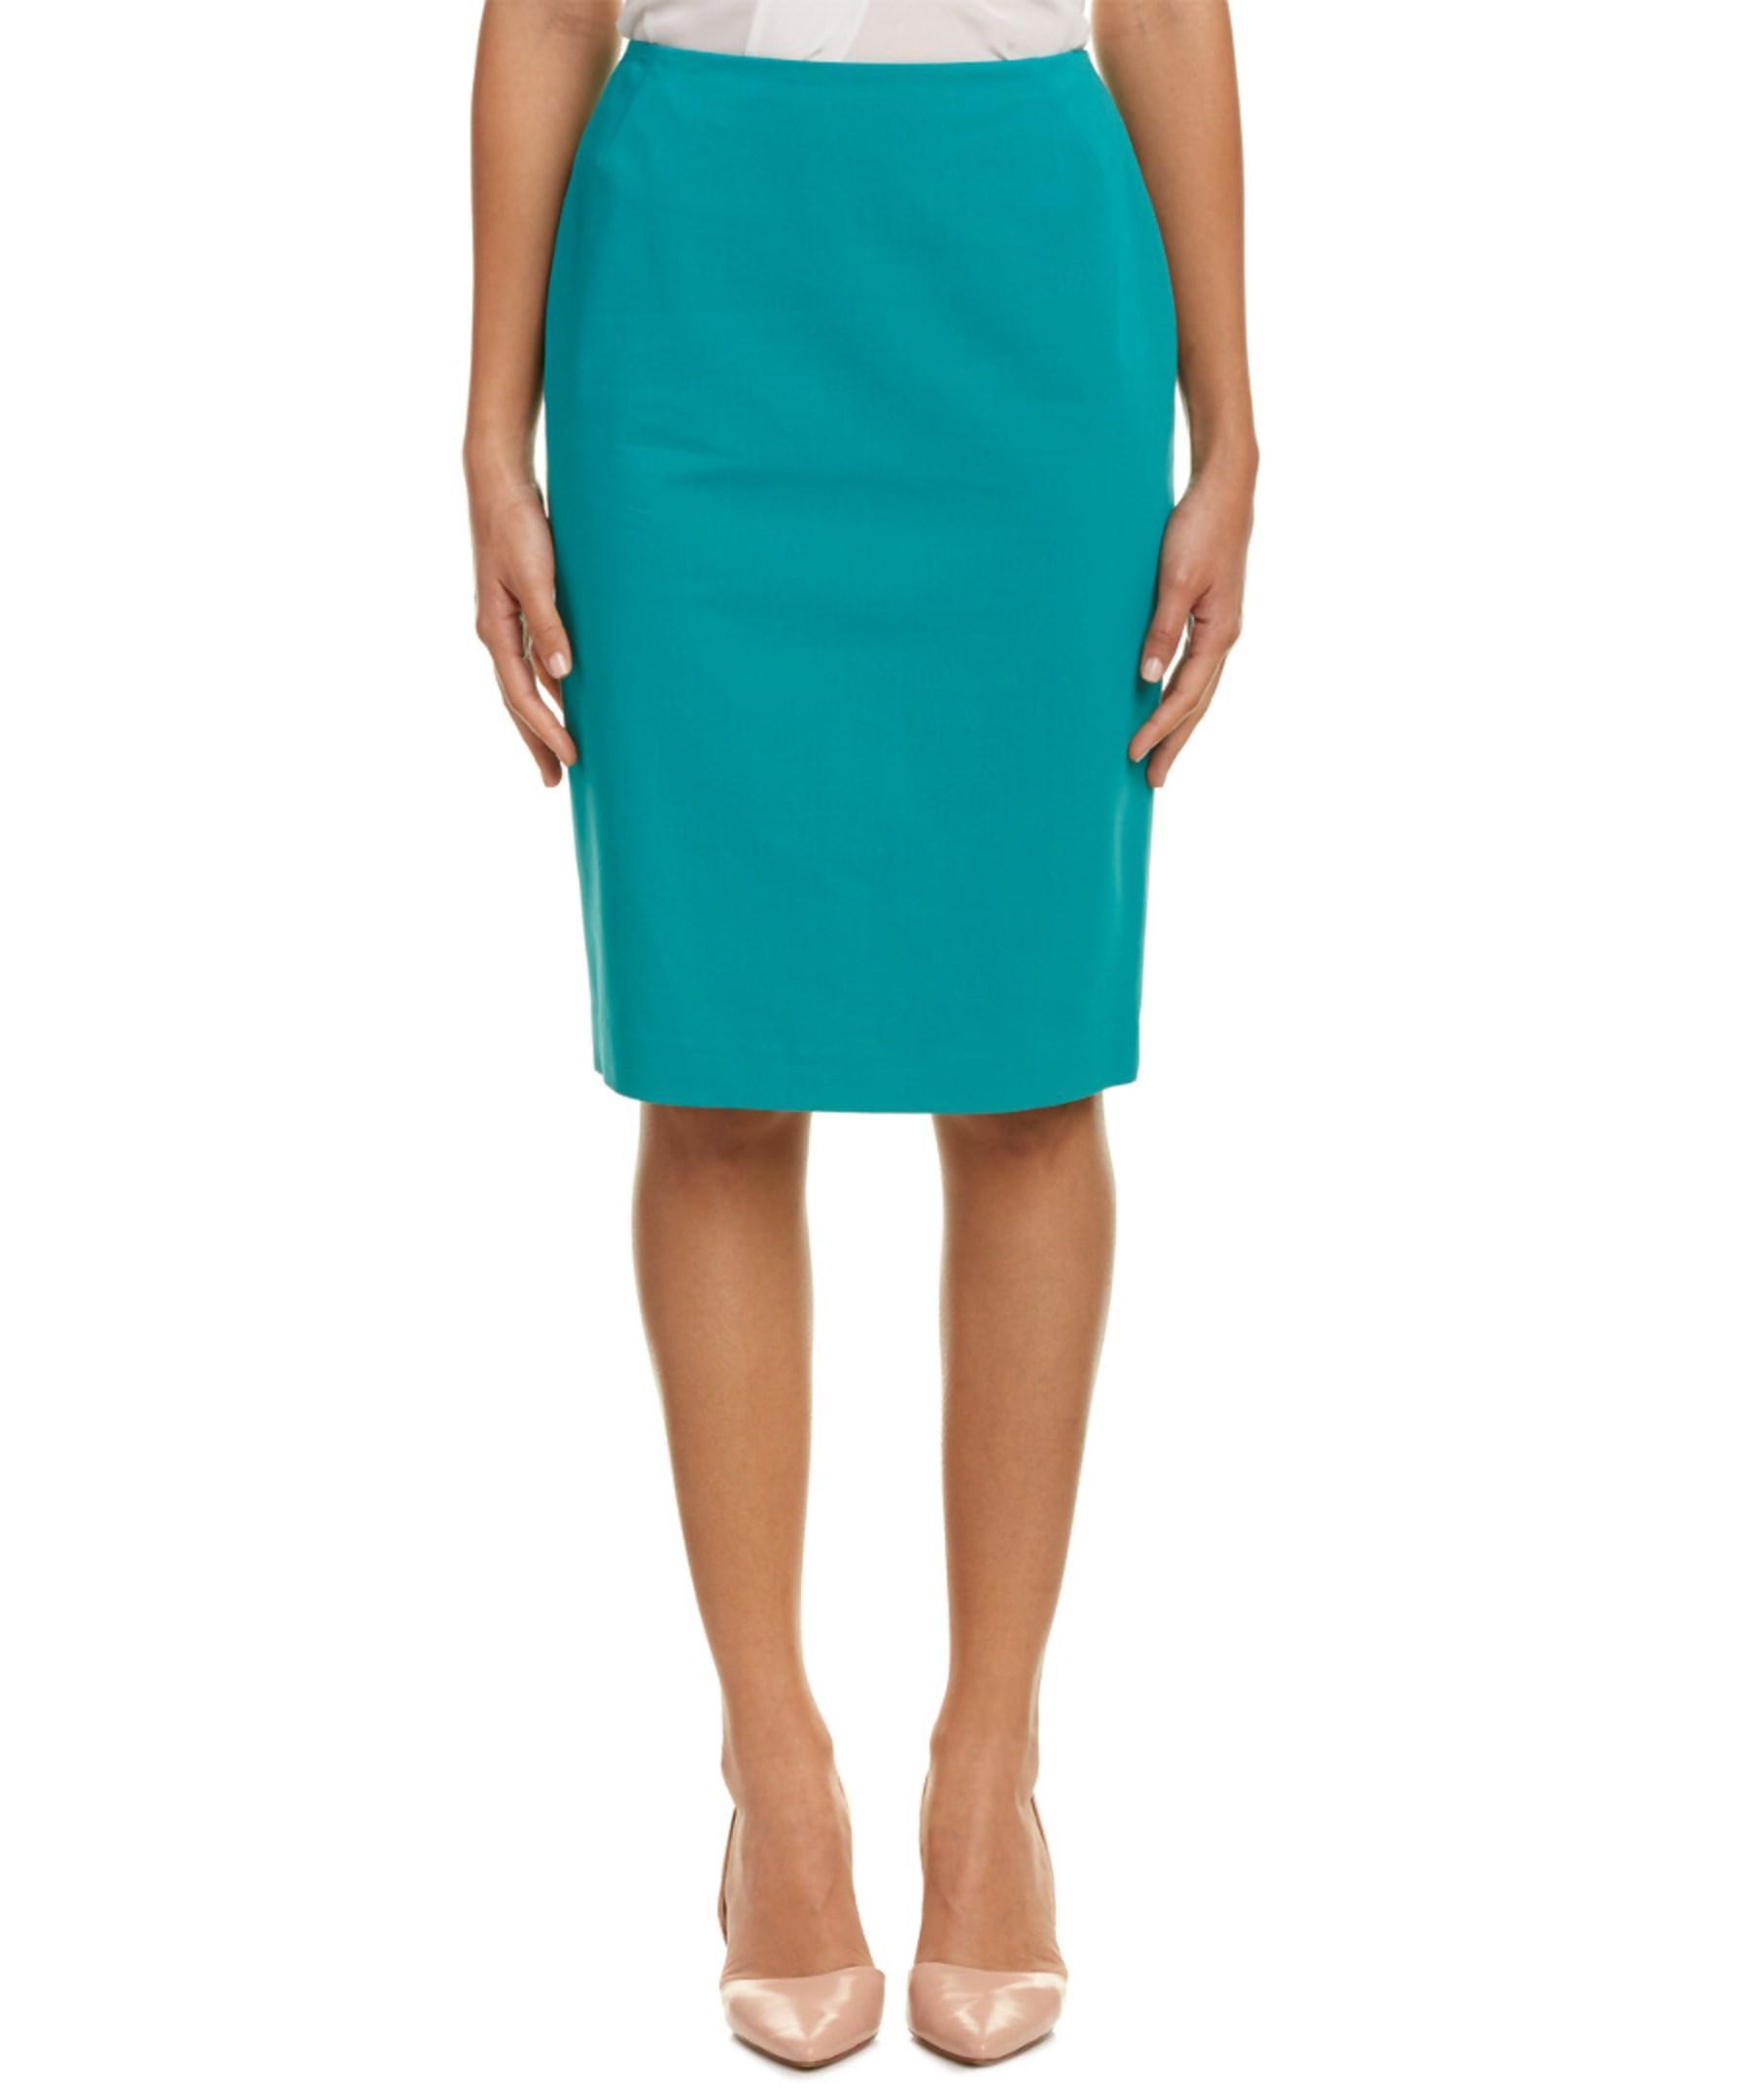 lafayette 148 new york pencil skirt in blue lyst